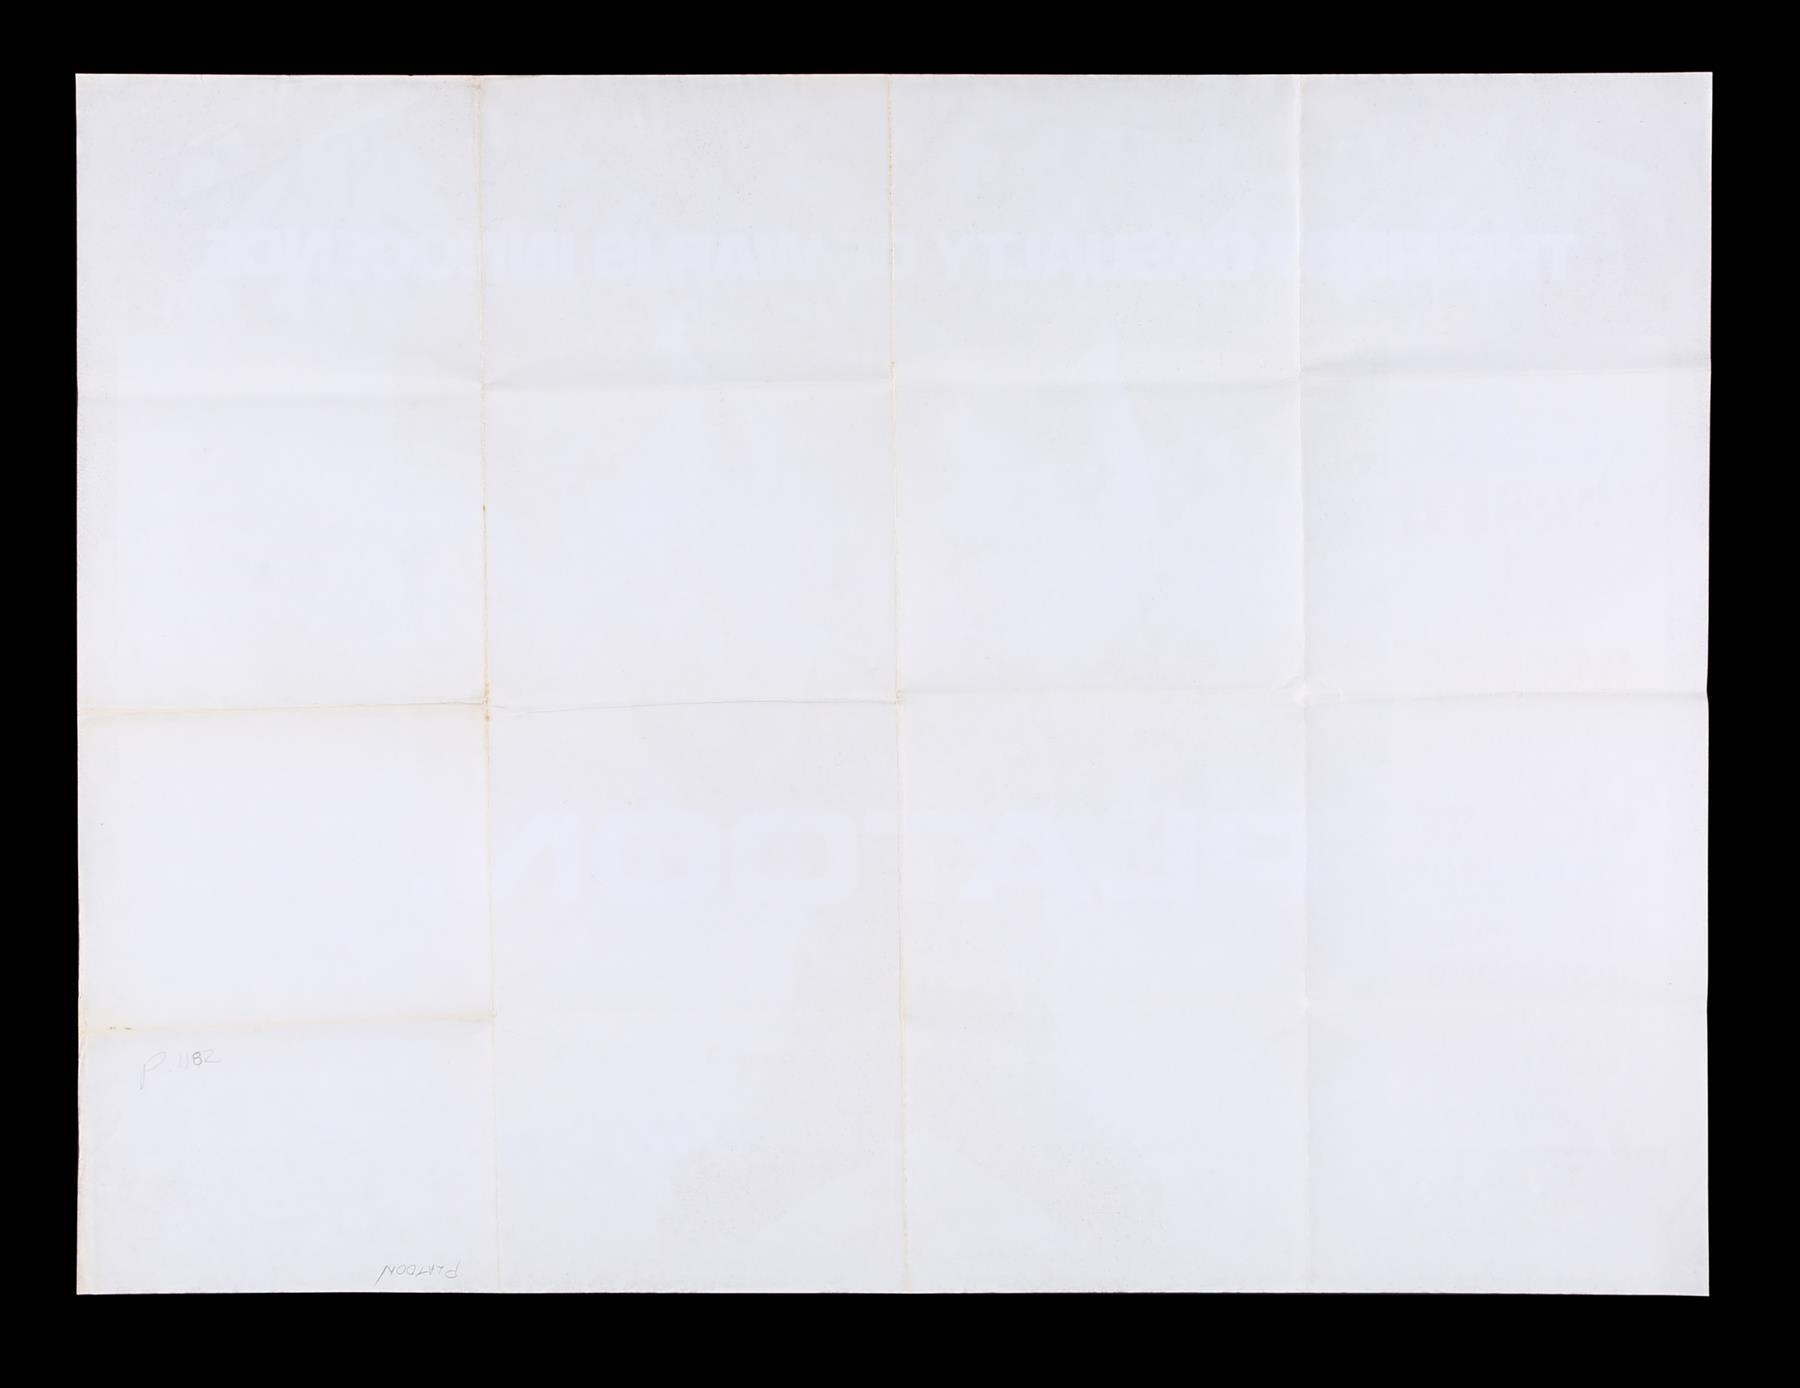 DEER HUNTER (1978), PLATOON (1986), RAGING BULL (1980) - Two UK Quads, US One-Sheet, 1978, 1980, 198 - Image 7 of 7